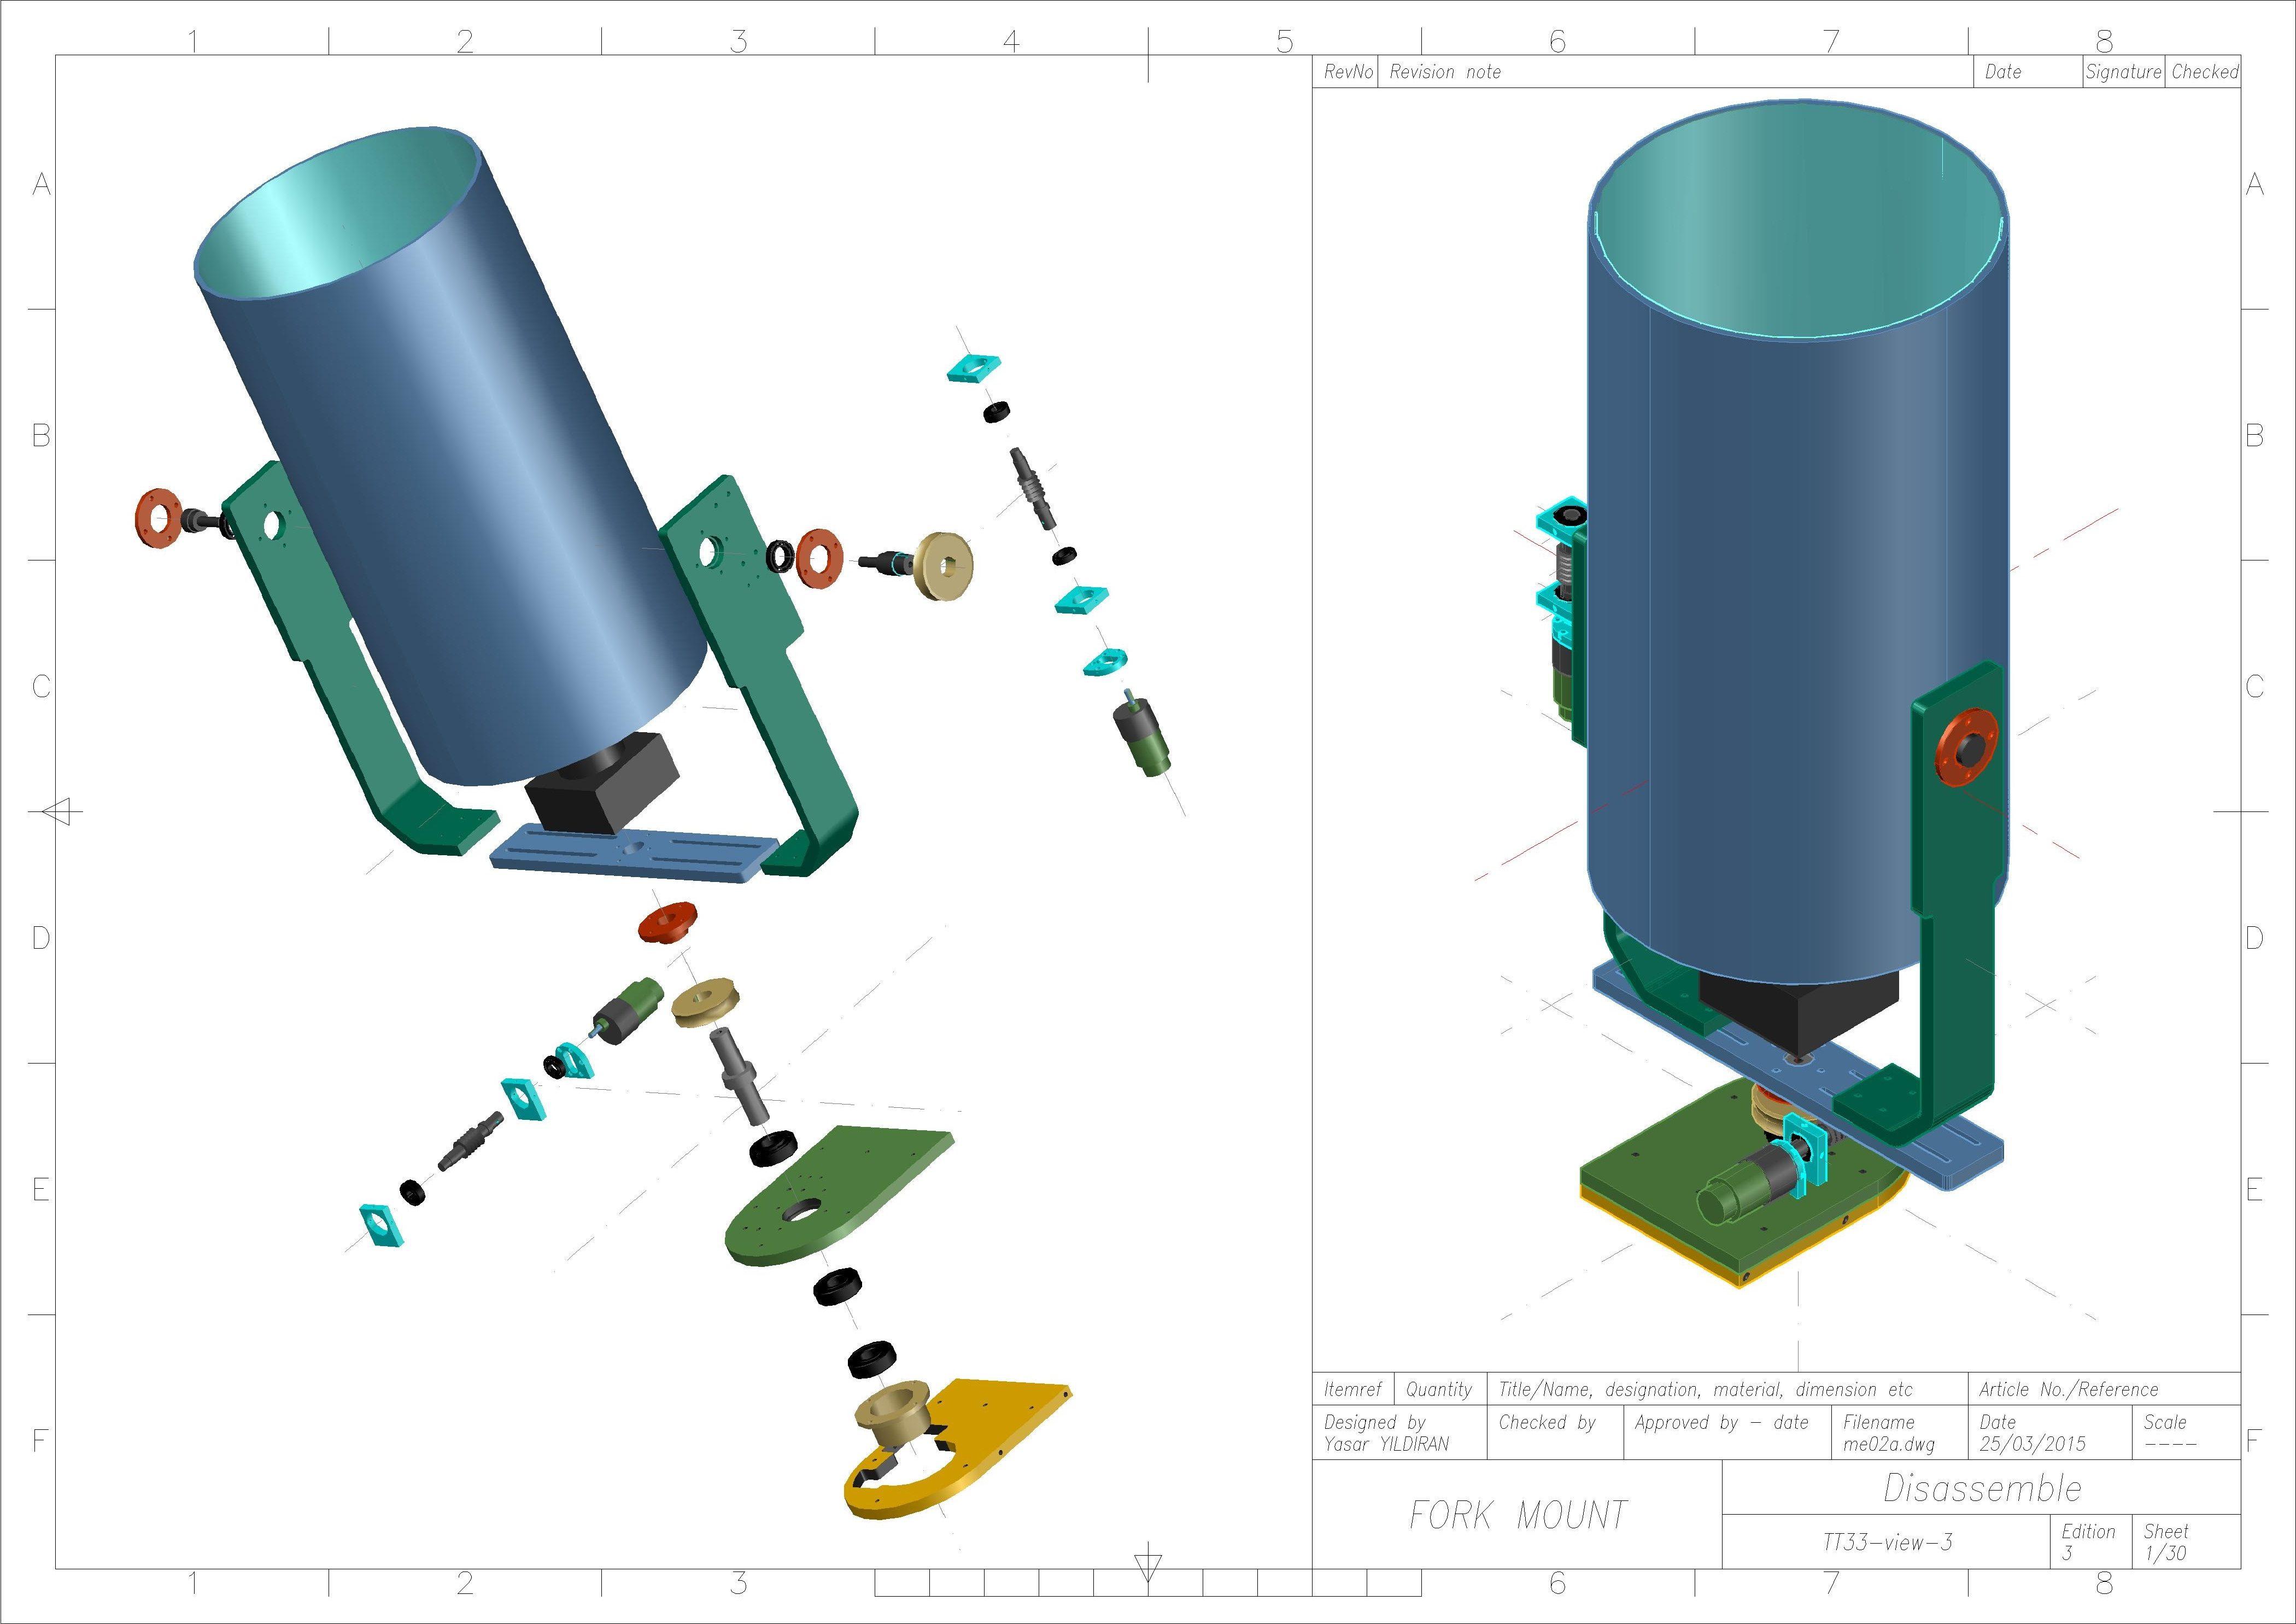 014 3d disassemble-tt31-3D view-3